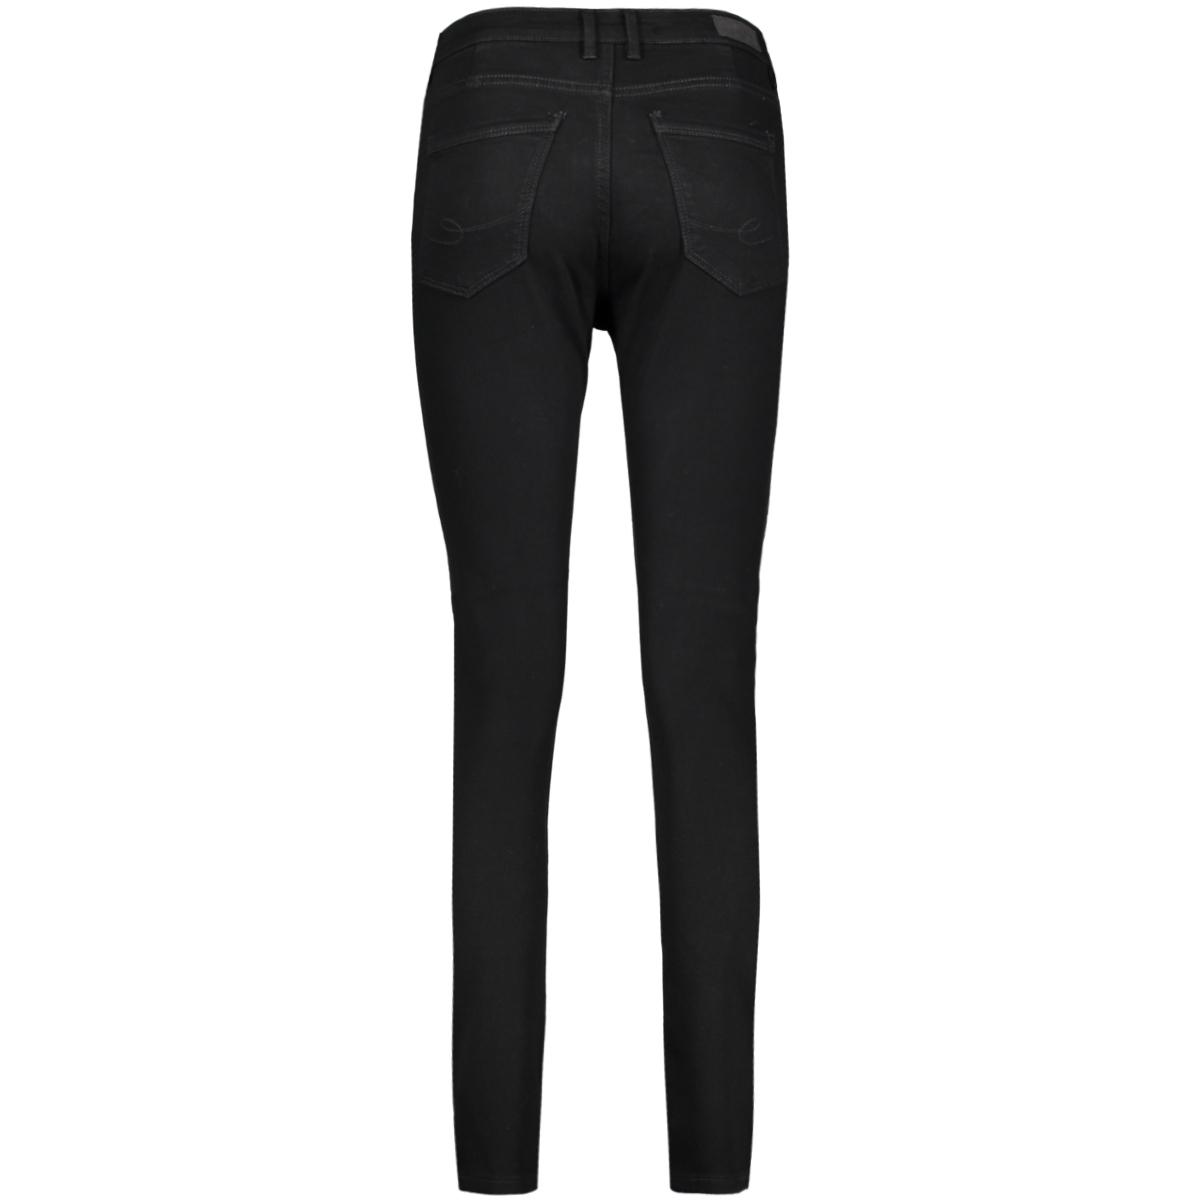 996cc1b909 edc jeans c910